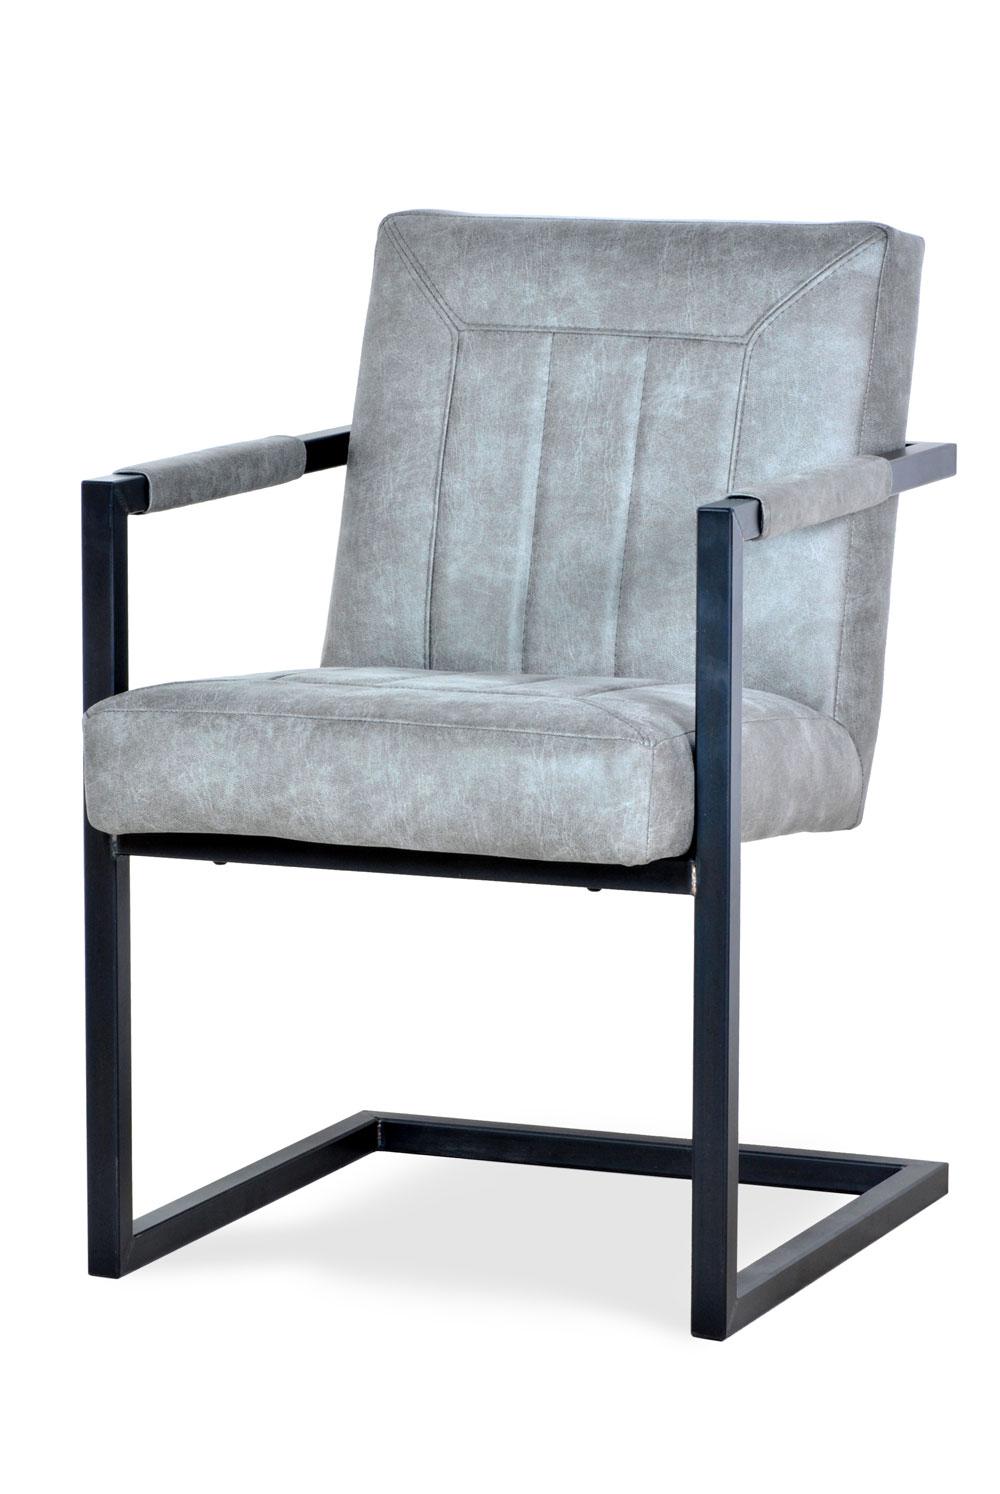 Cadira-Arm-szycie-C-Cover-bull-grey-65-(o2)-kopia